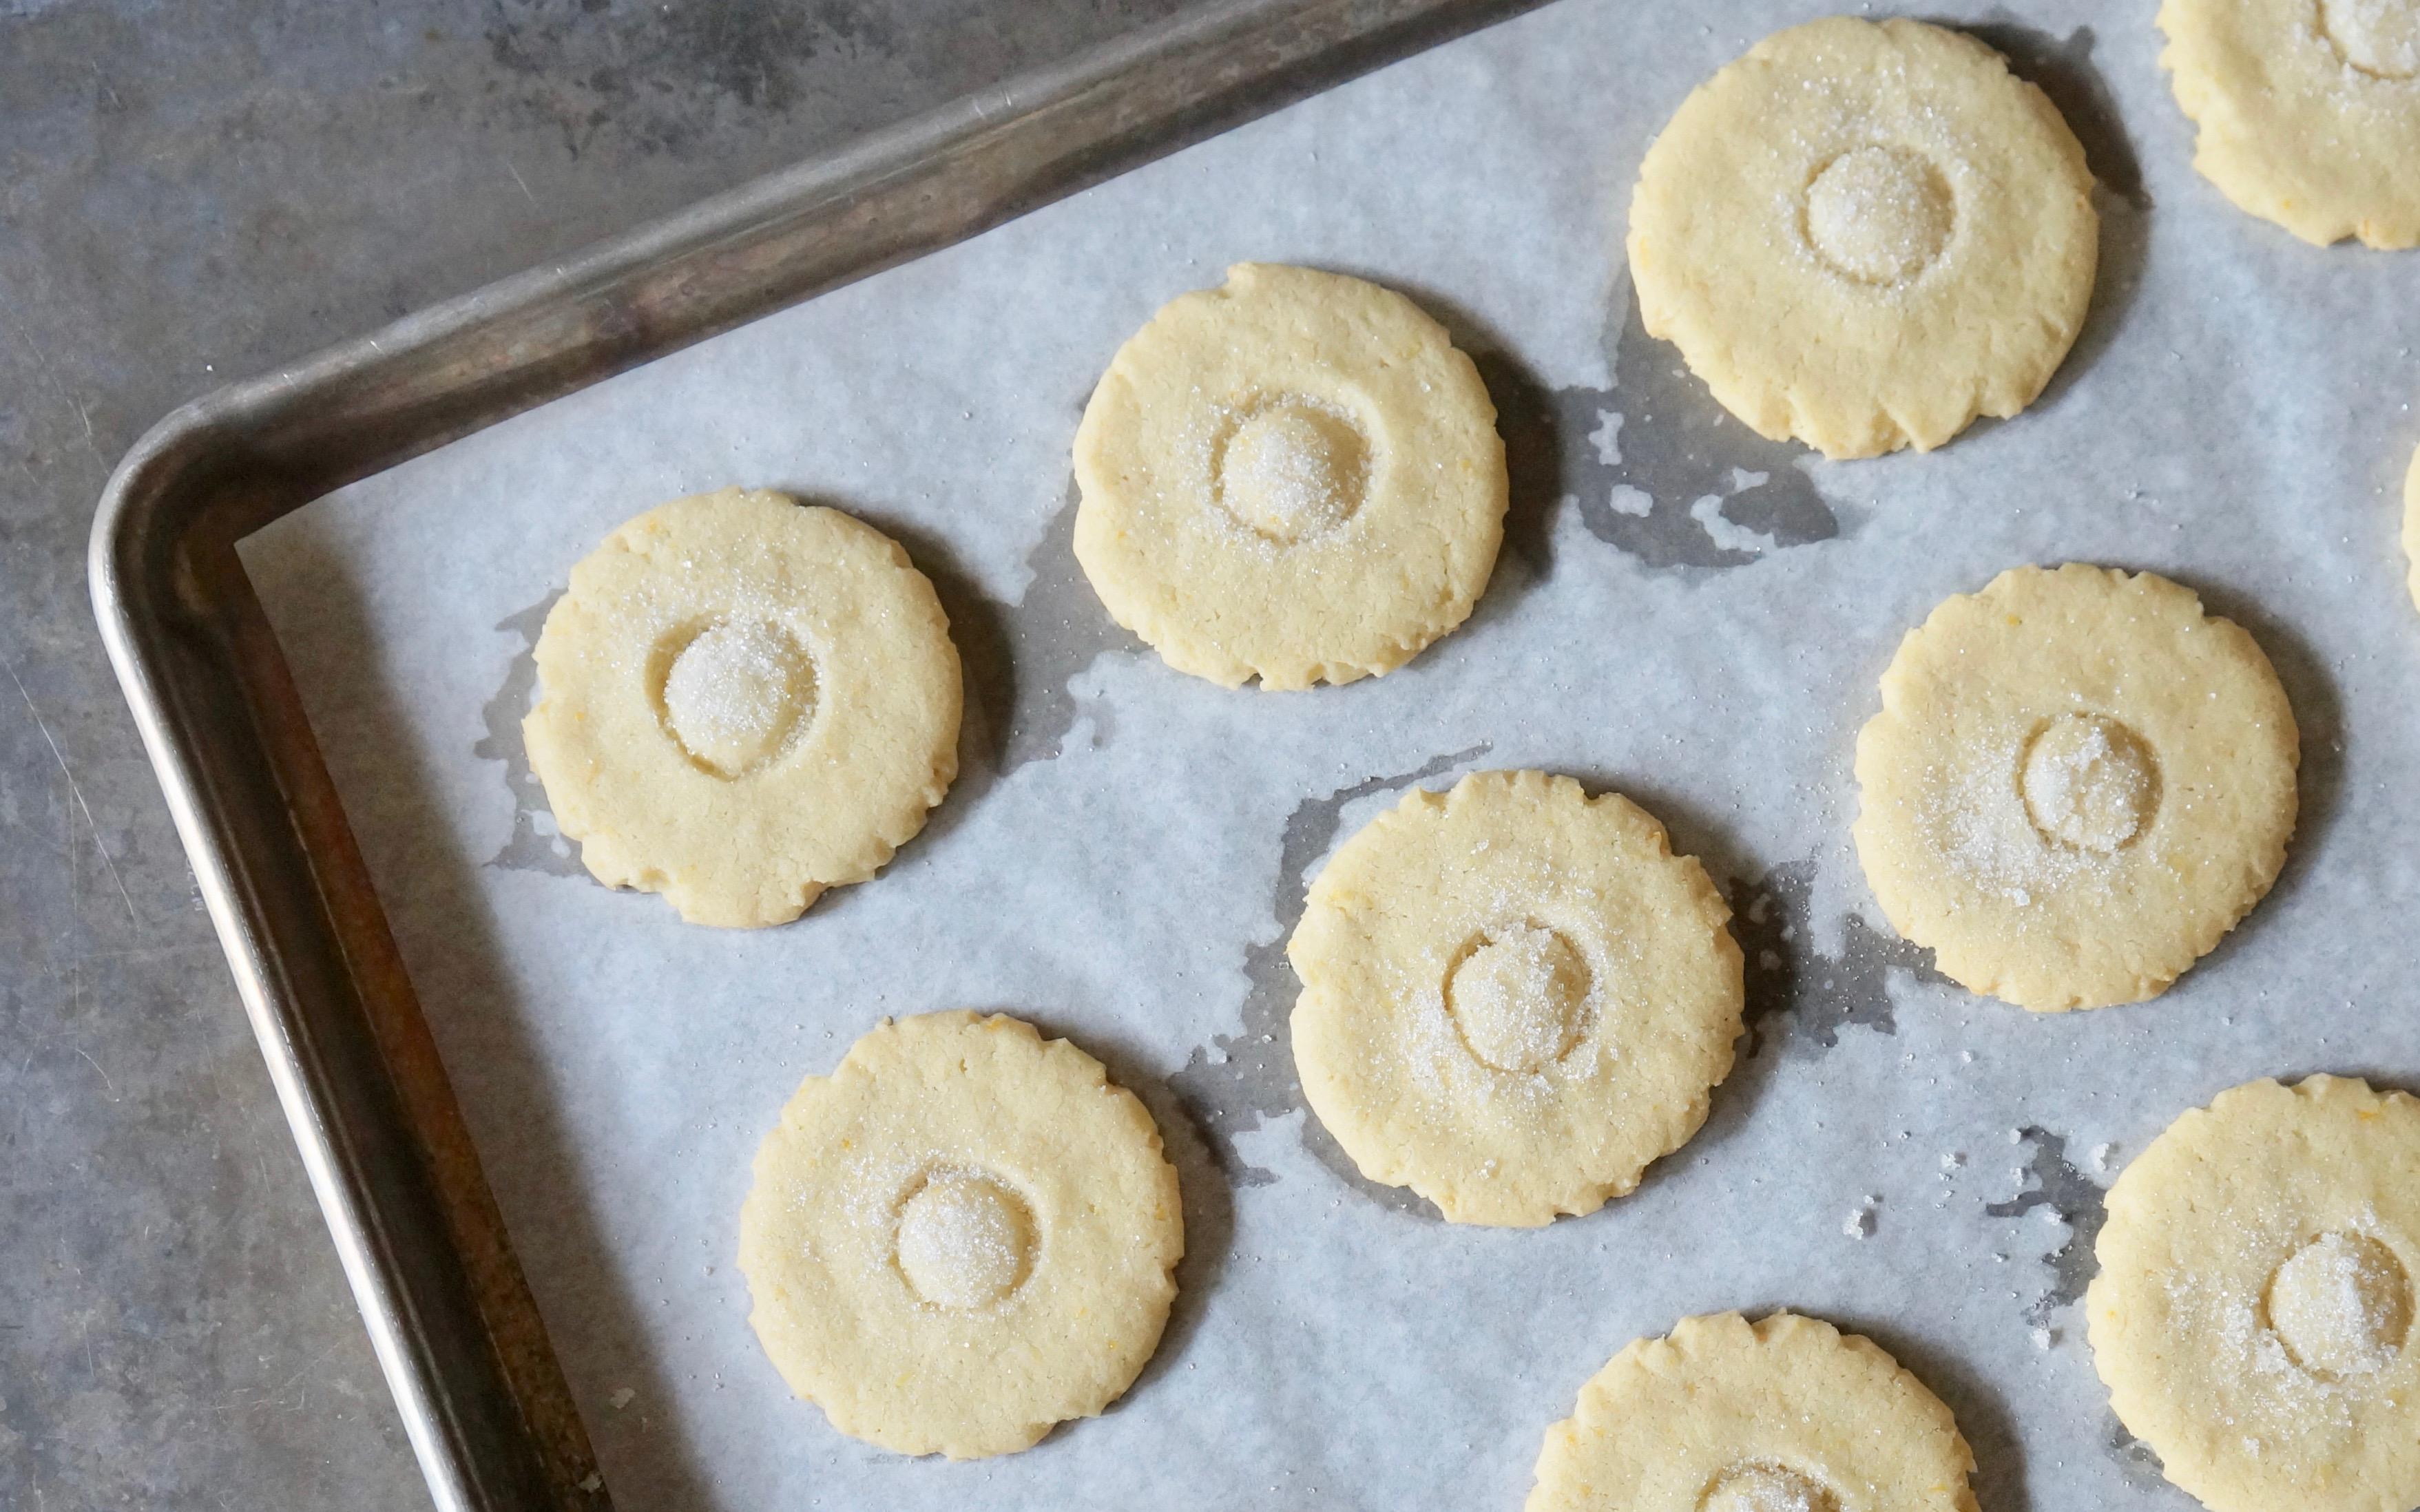 Polvorones Con Aroma A Naranja-Rebecca-Gordon-Editor-In-Chief-Buttermilk-Lipstick-Culinary-Entertaining-Techniques-Baking-Classic-Mexican-Sugar-Cookies-RebeccaGordon-Pastry-Chef-Birmingham-Alabama